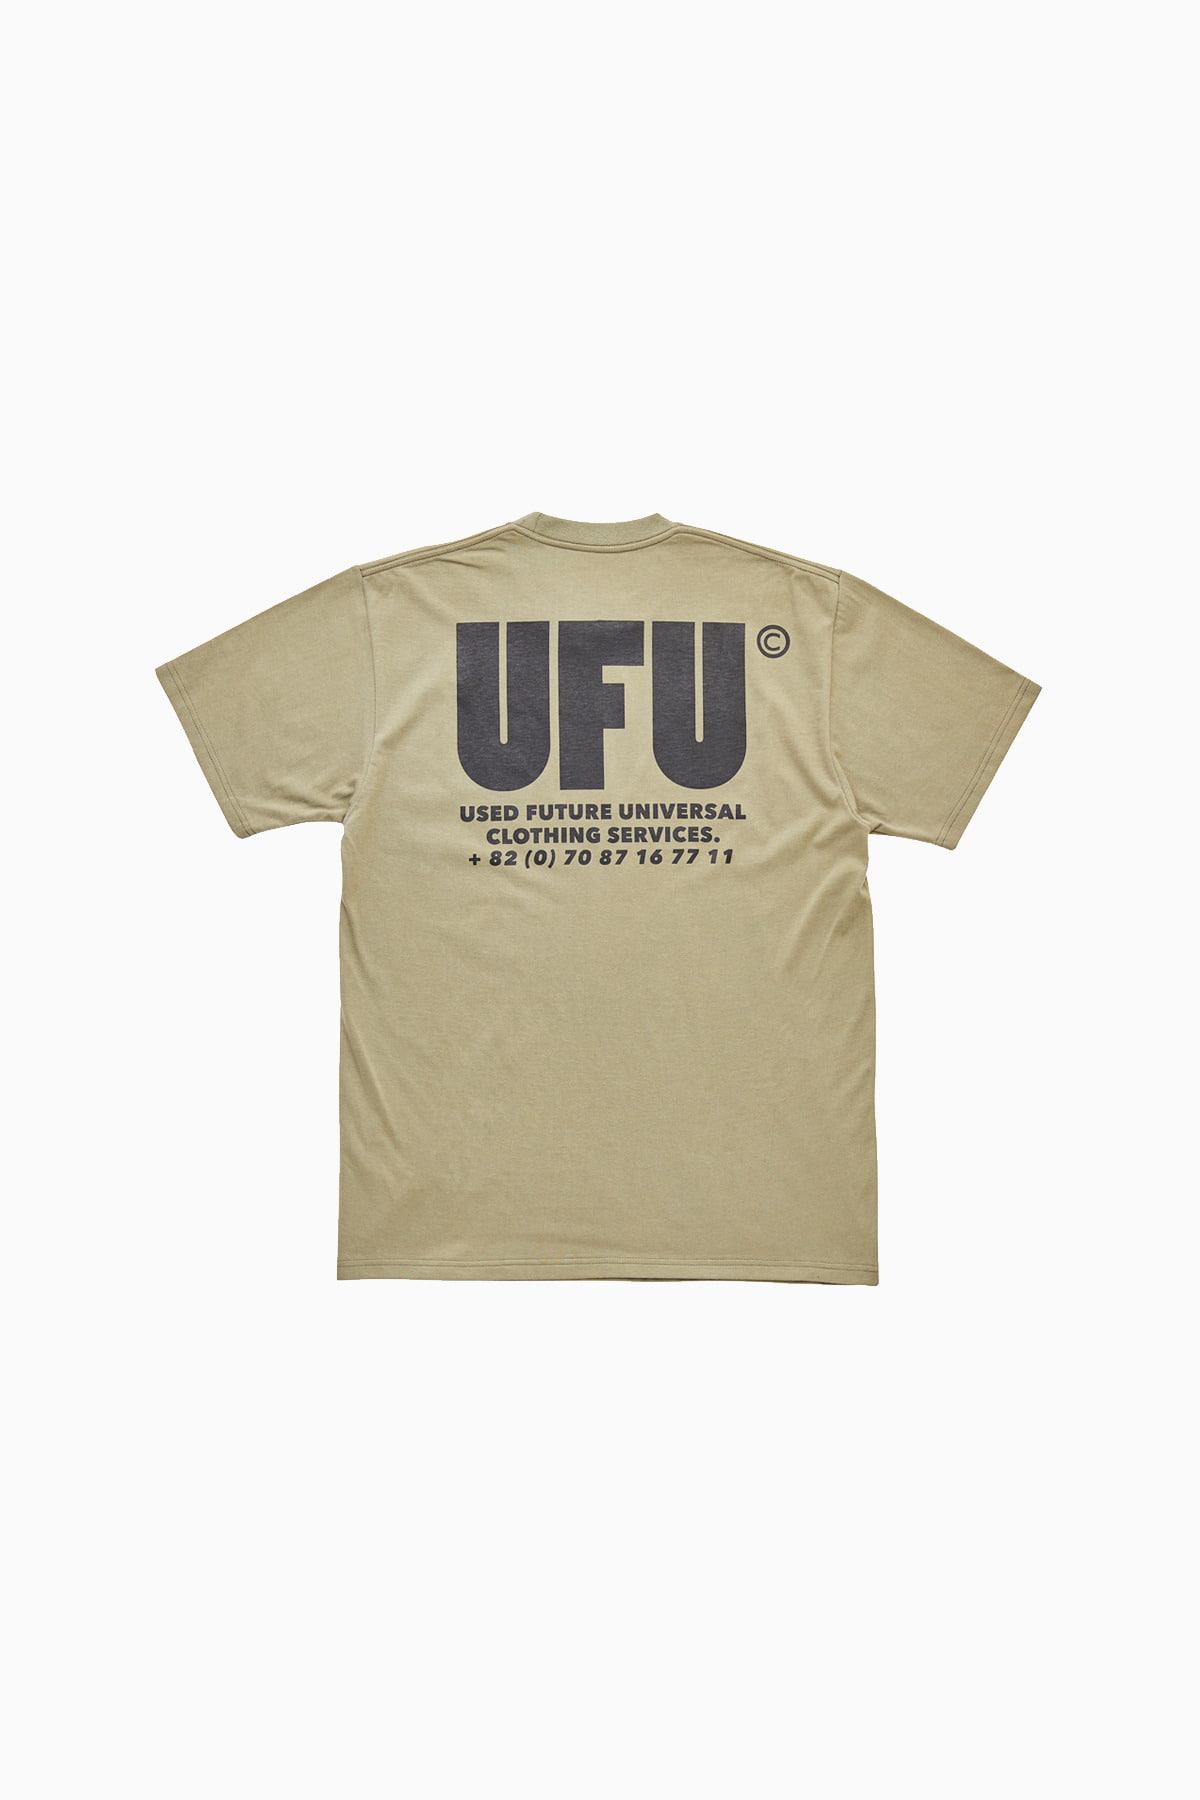 UFU AD T-SHIRT_KHAKI